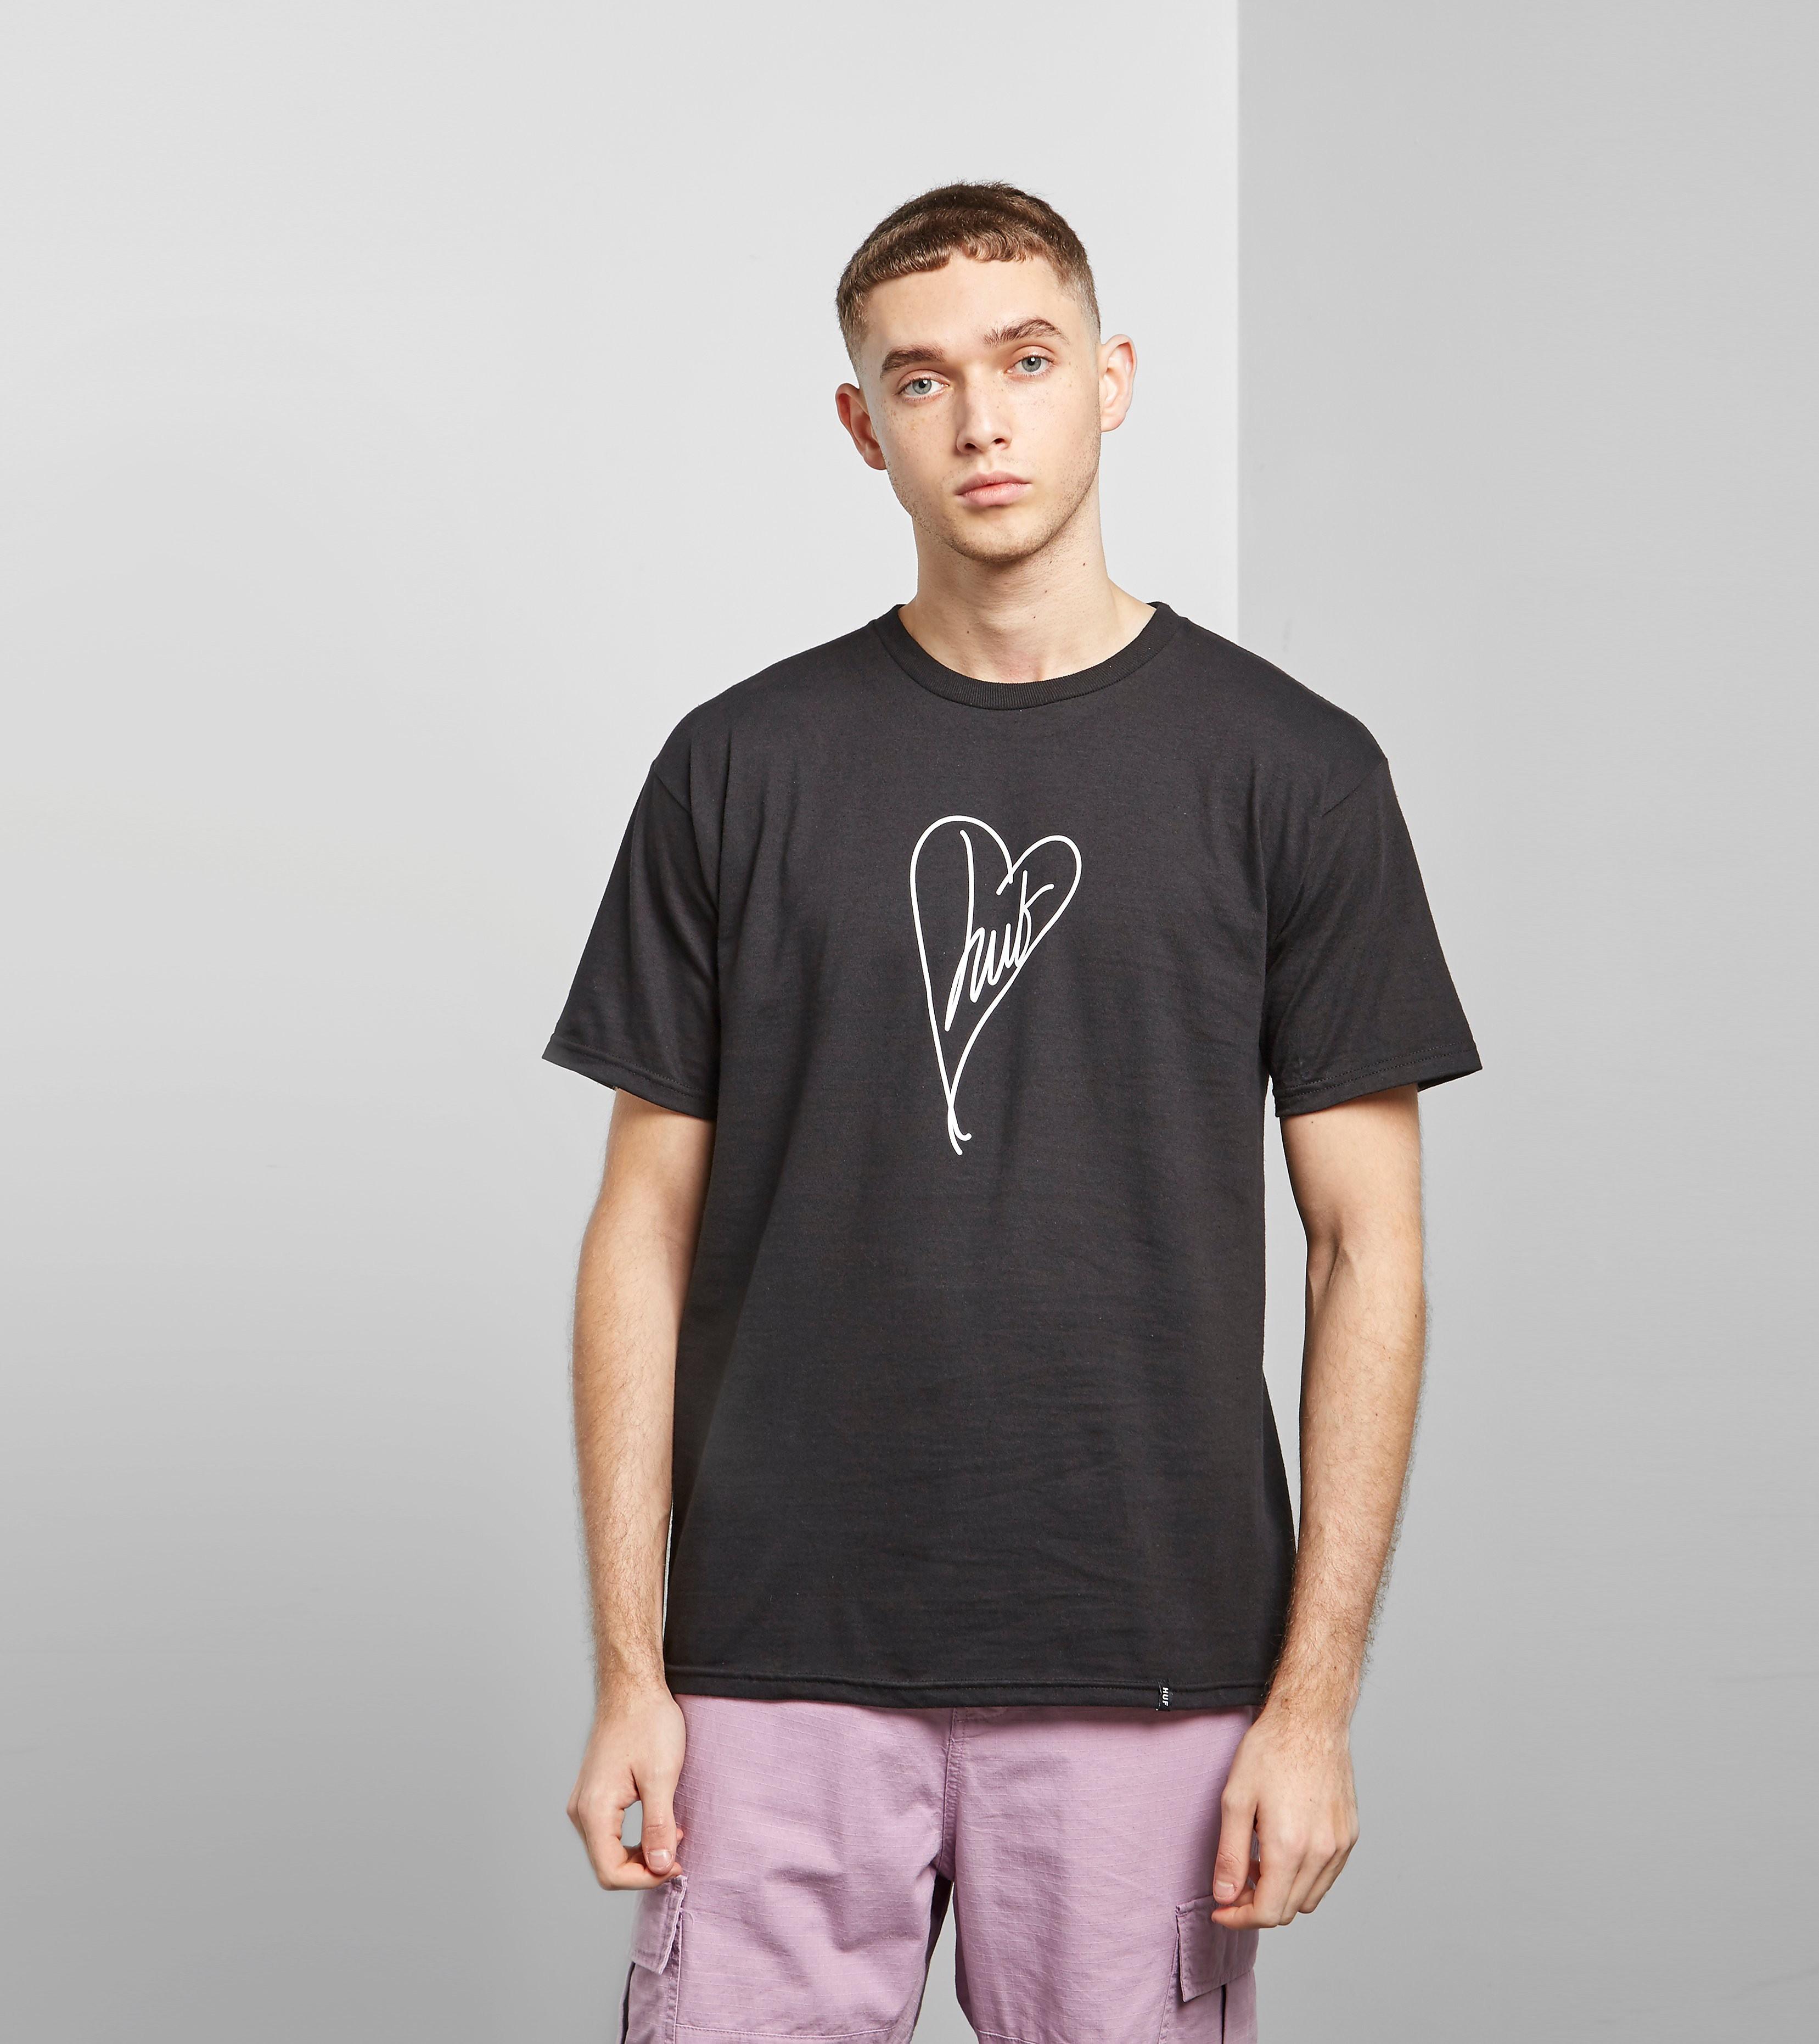 HUF 1979 T-Shirt